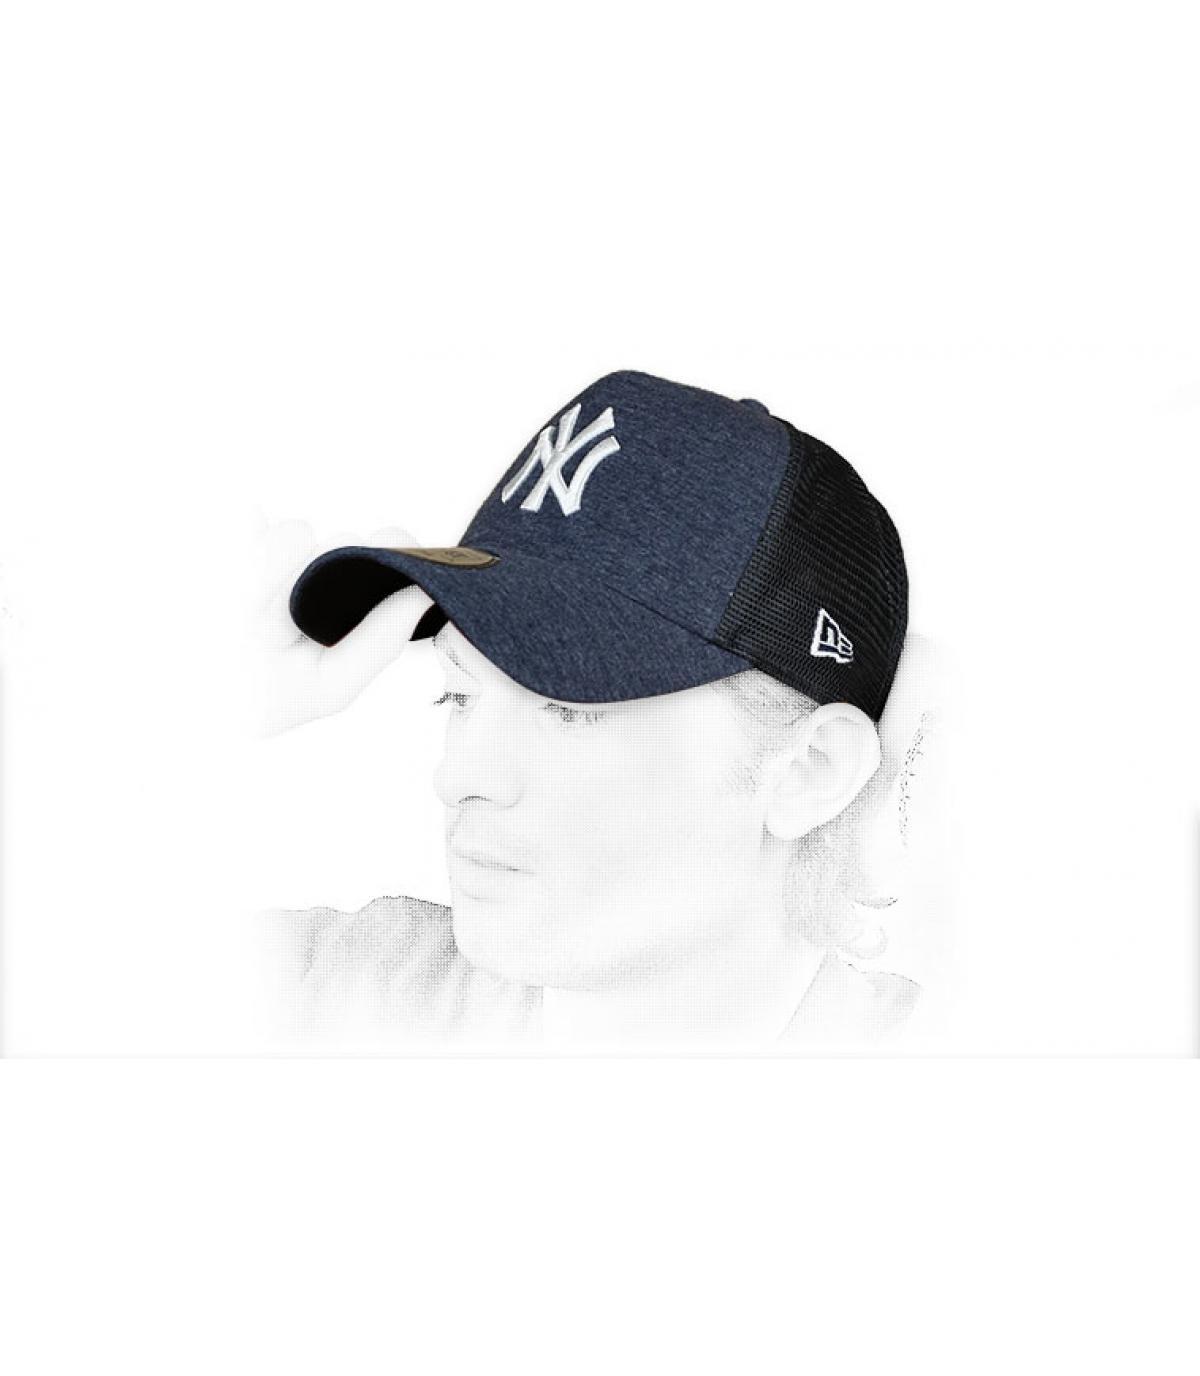 Trucker NY blau weiß